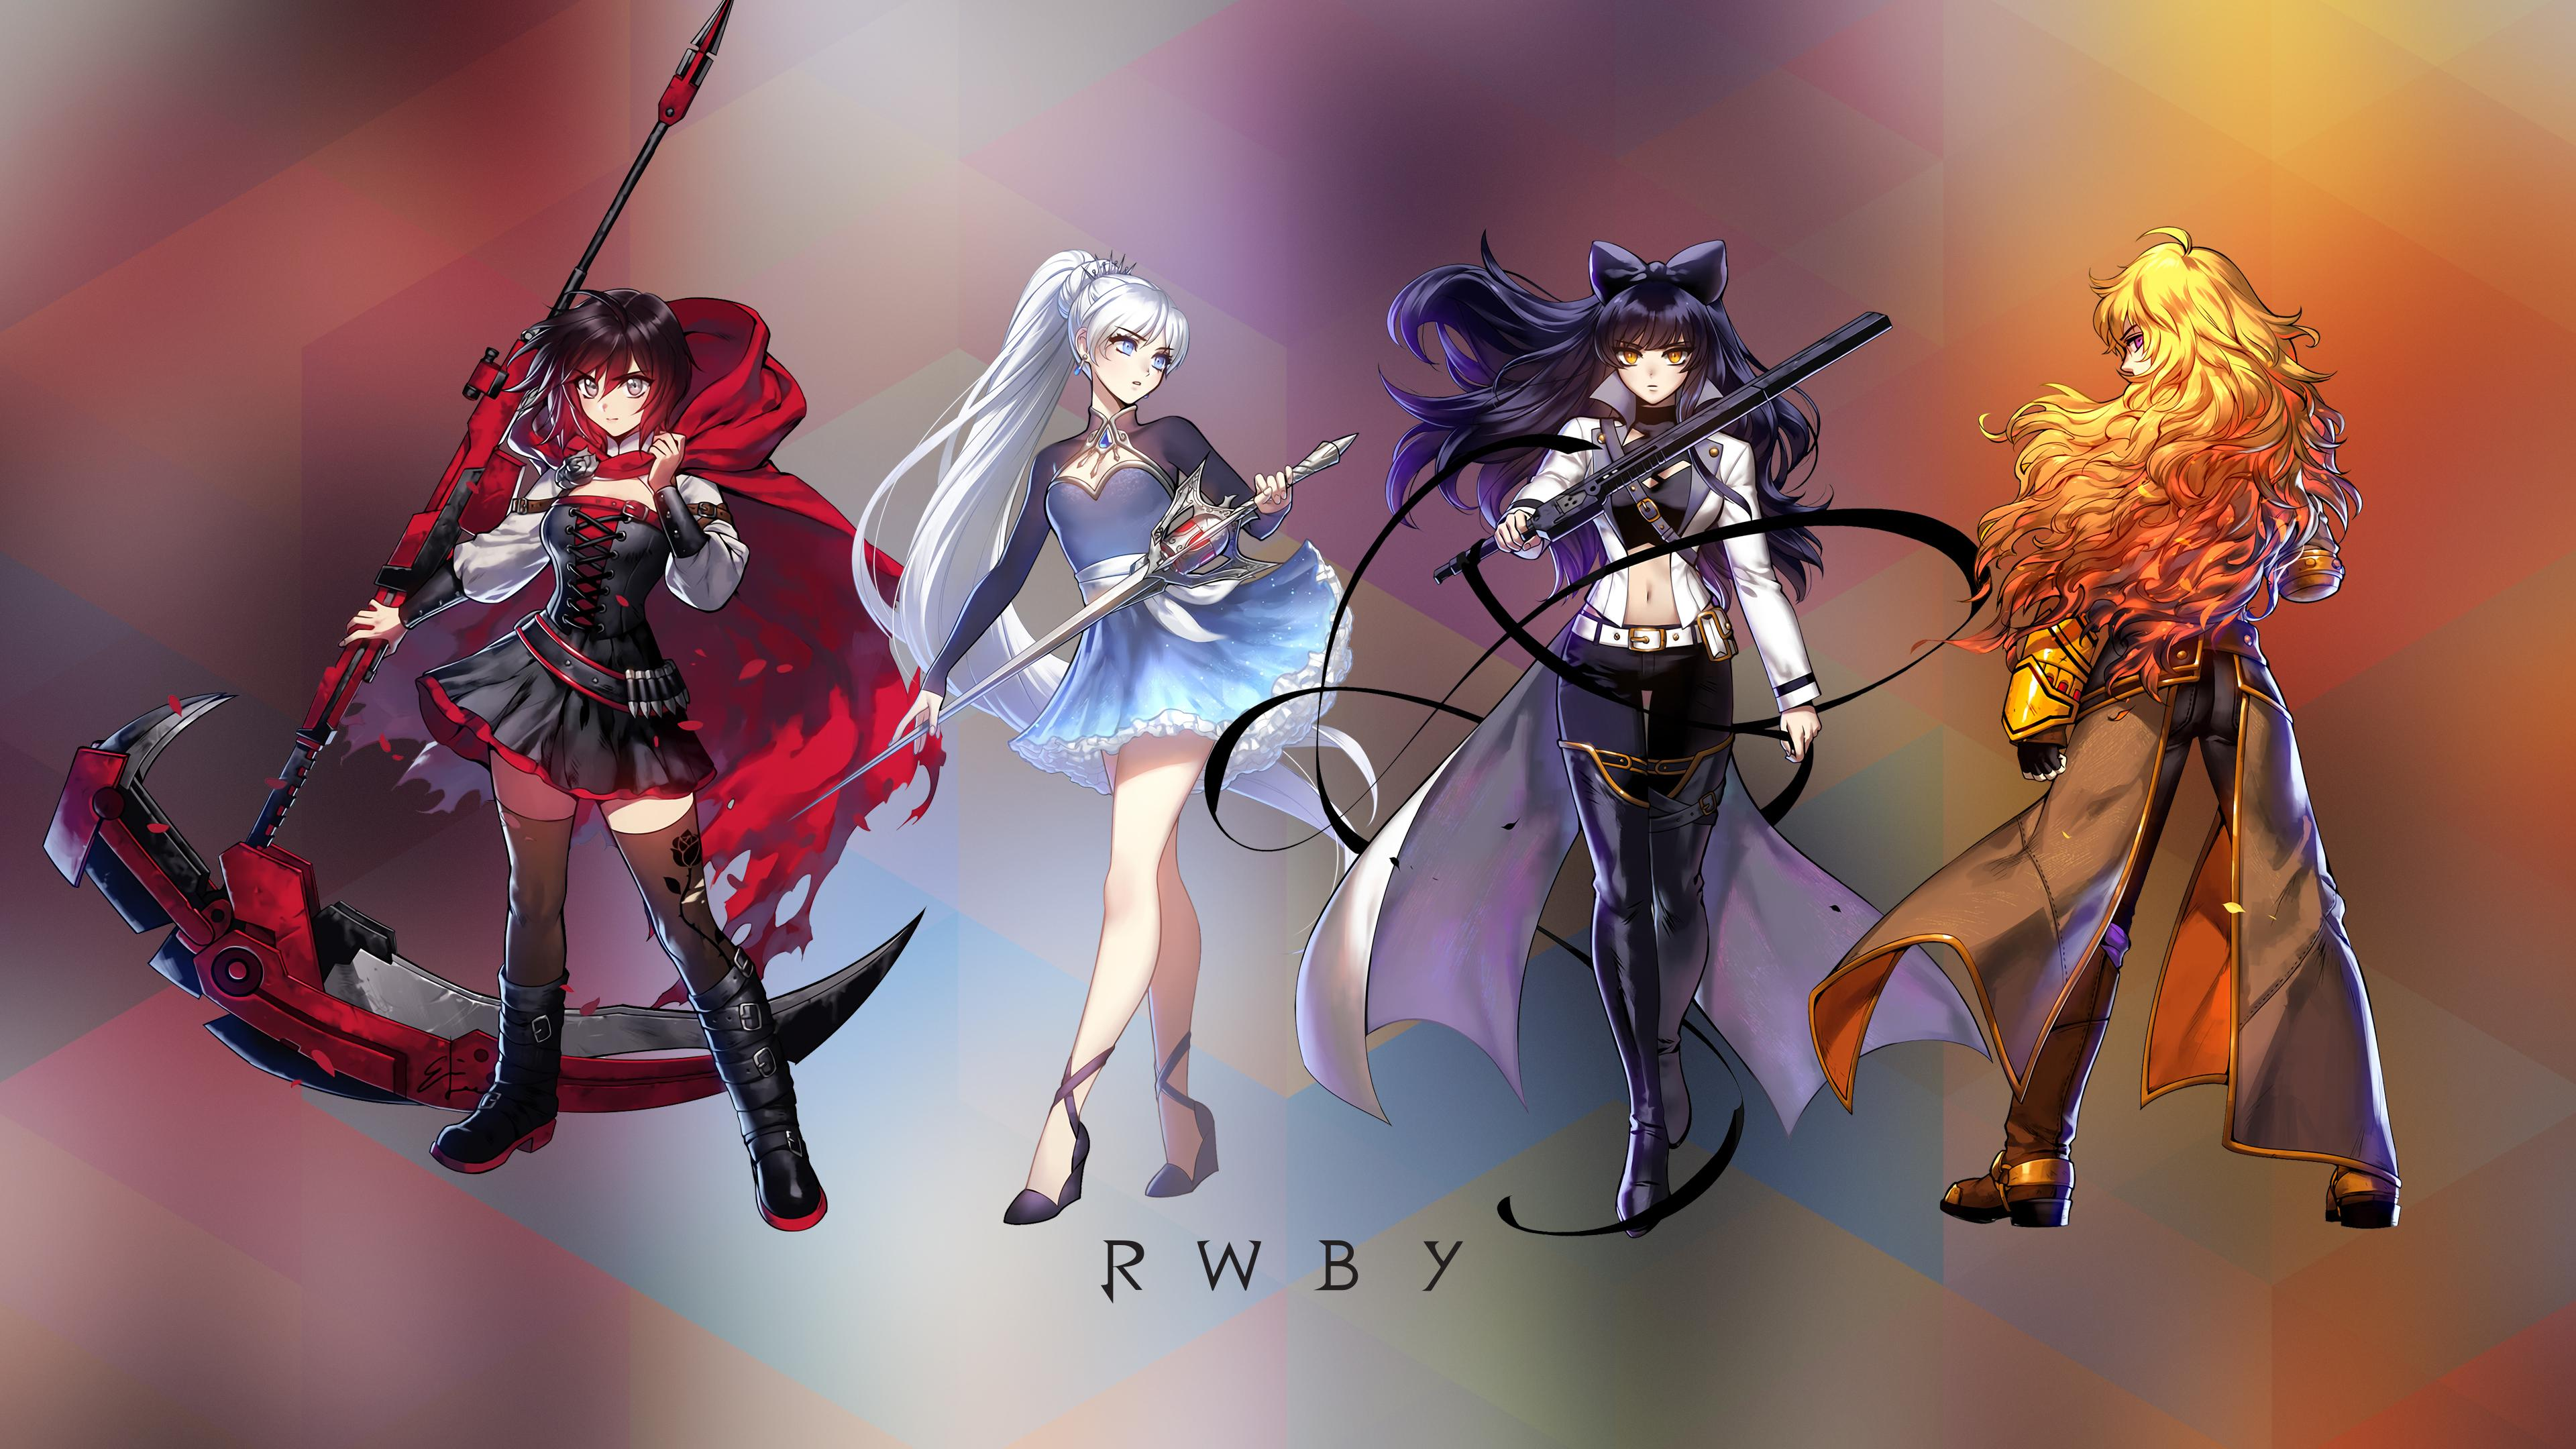 rwby wallpaper hd 1080p